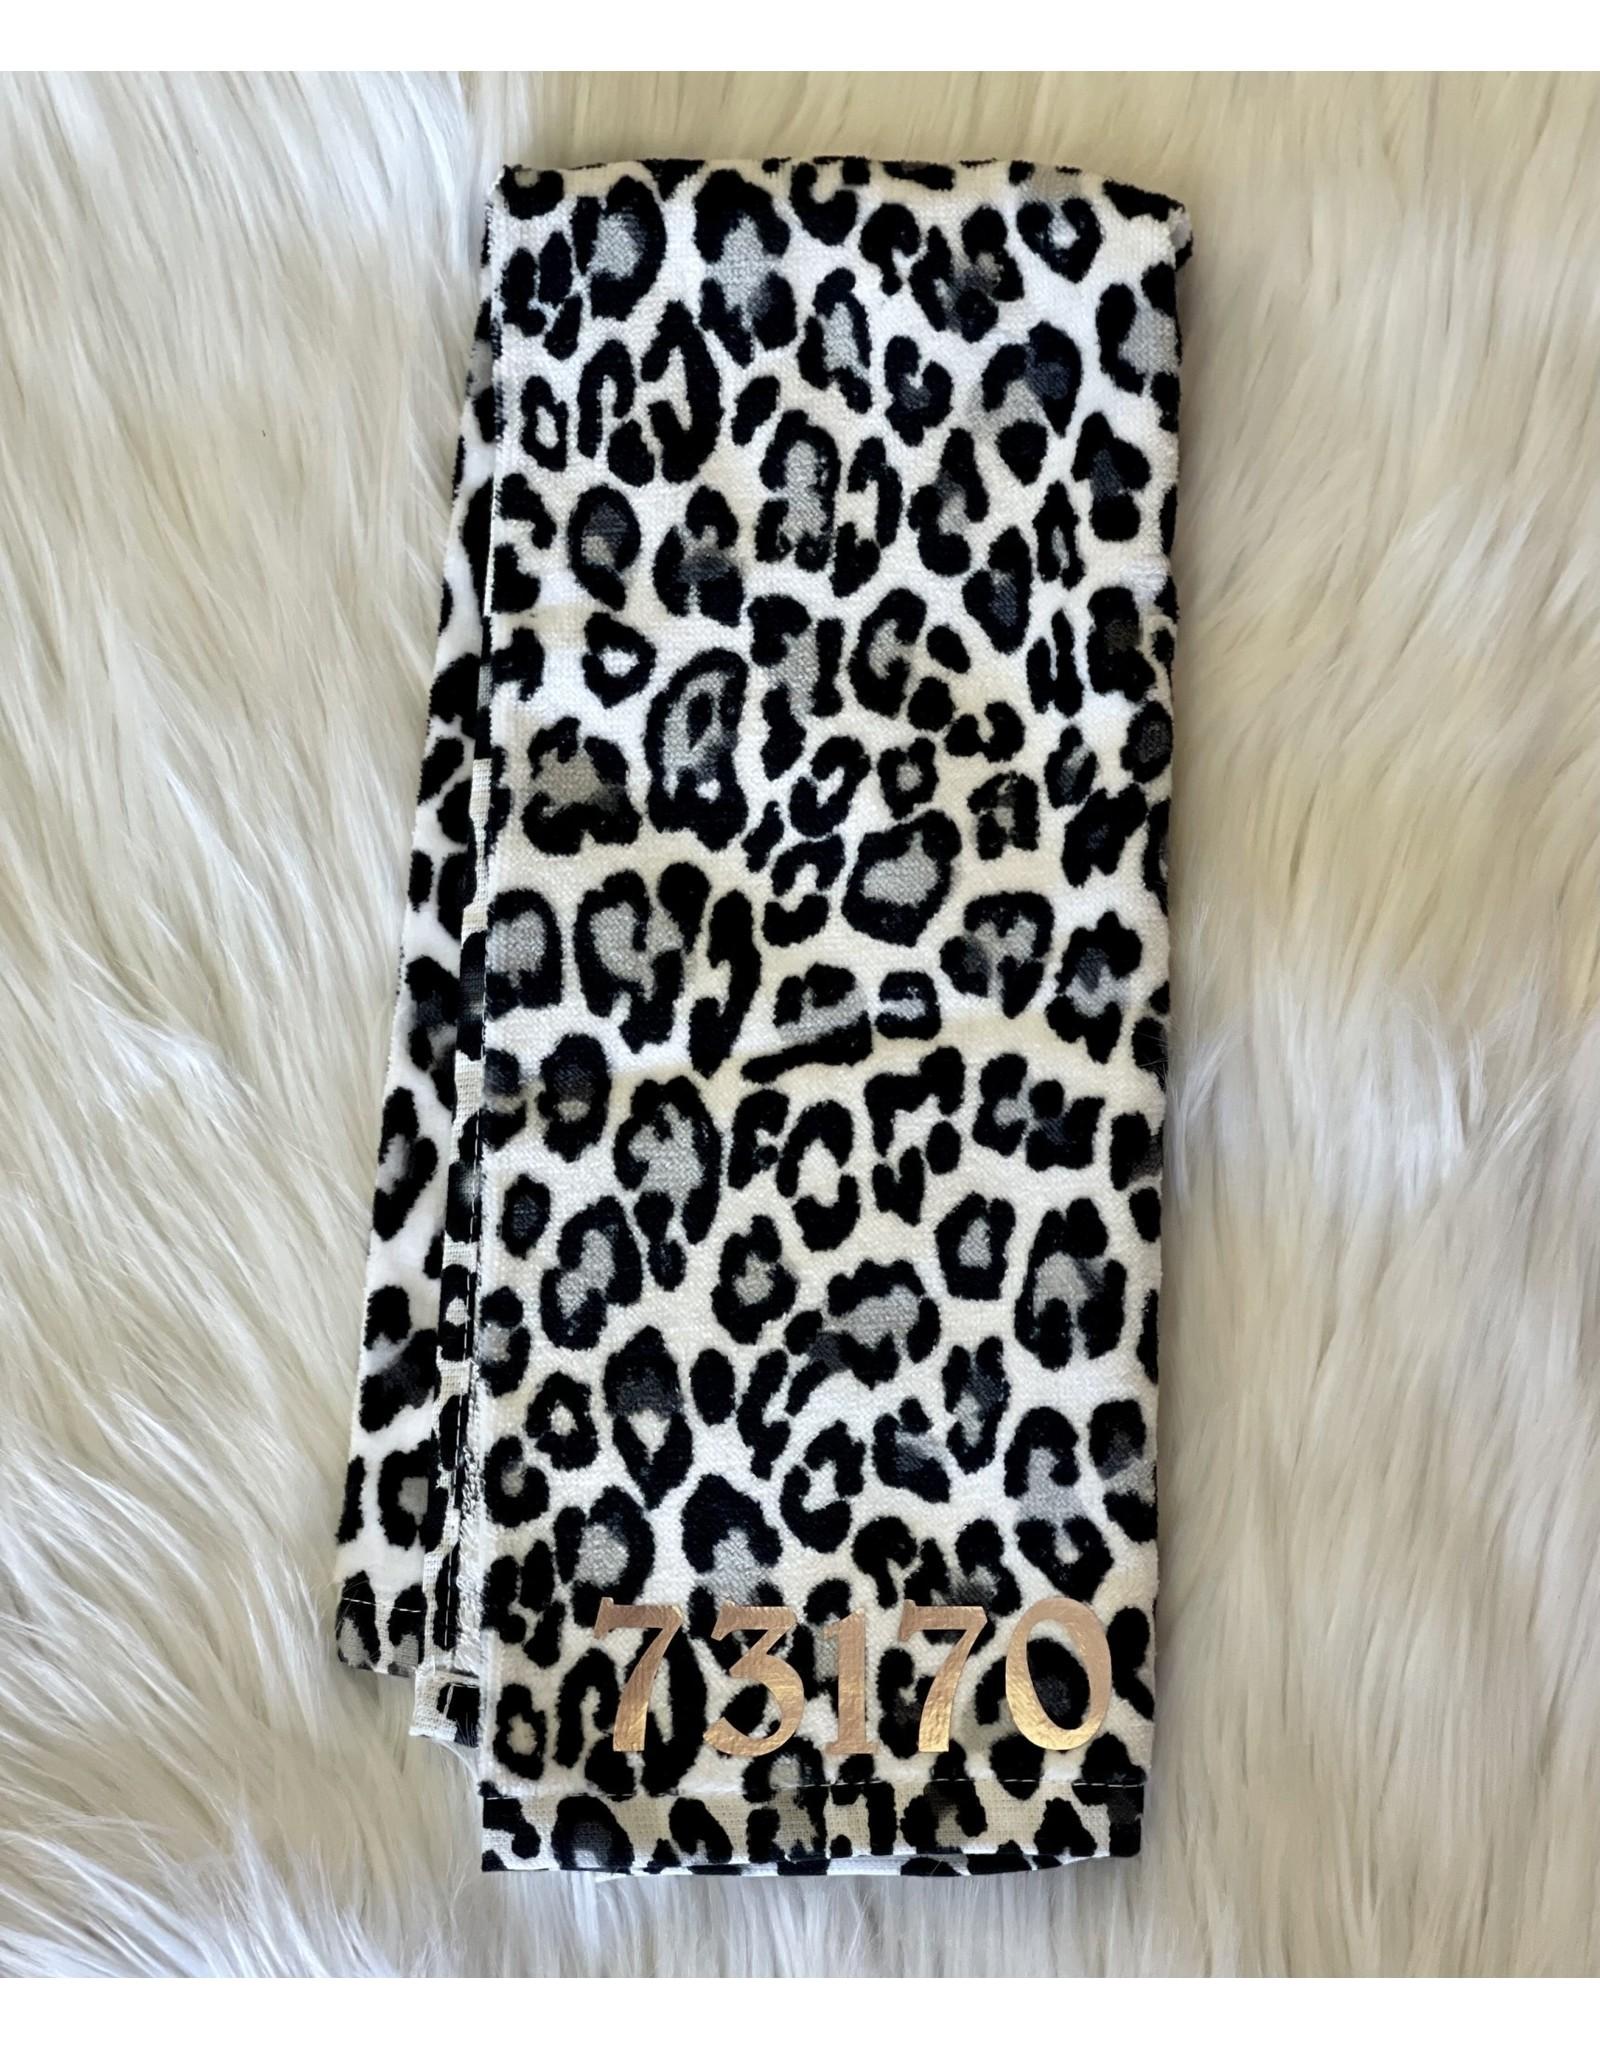 The Ritzy Gypsy Zip Code Leopard Towel